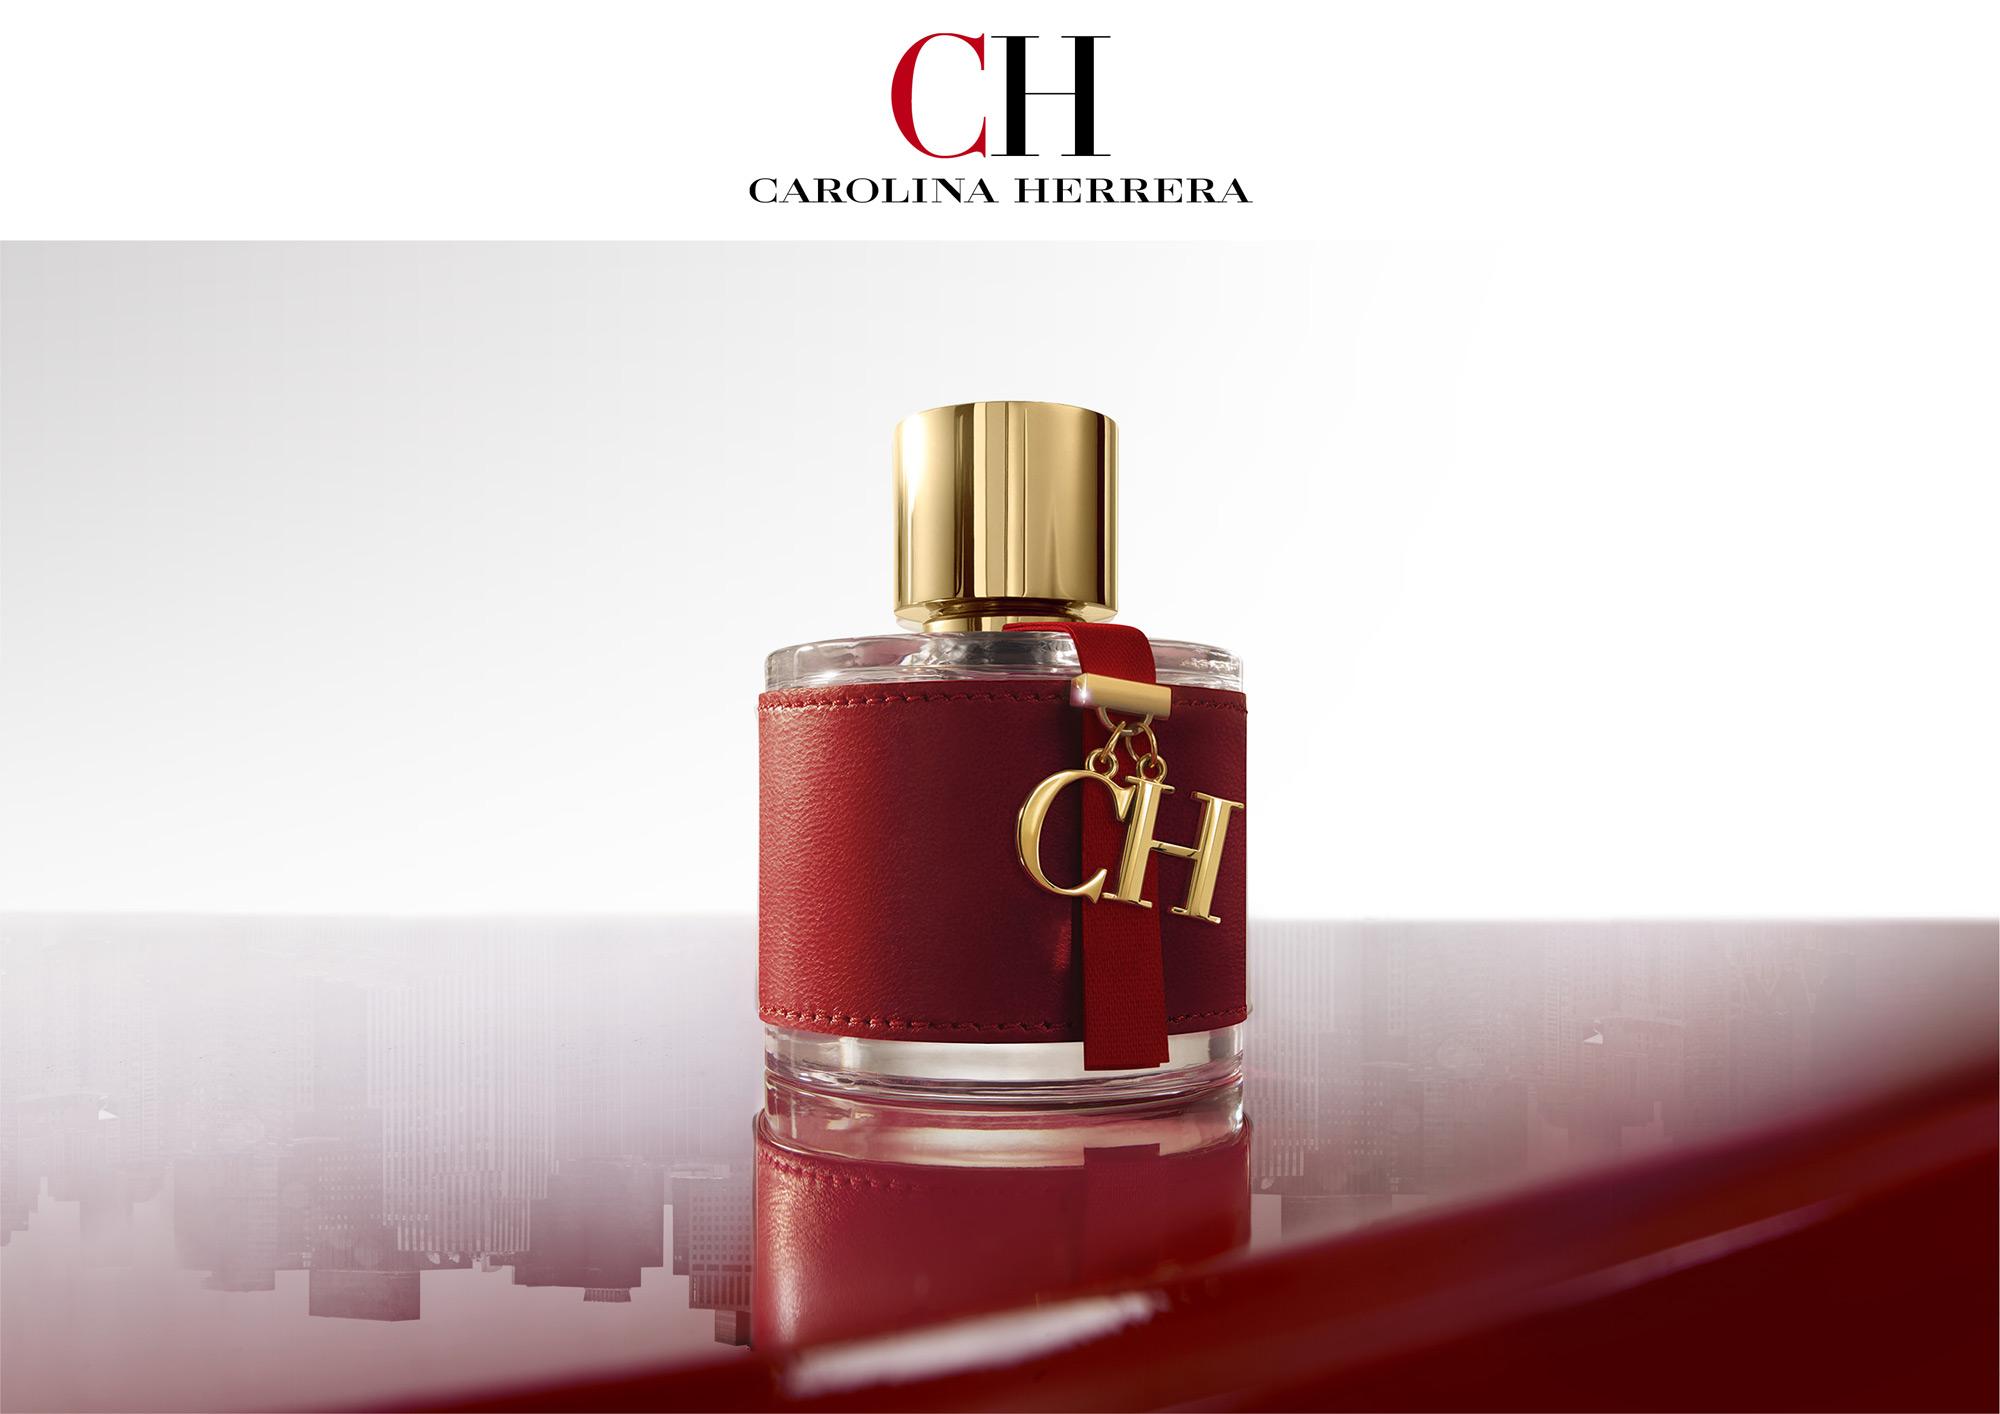 CH (2015) Carolina Herrera perfume - a fragrância Feminino 2015 b172163f2a